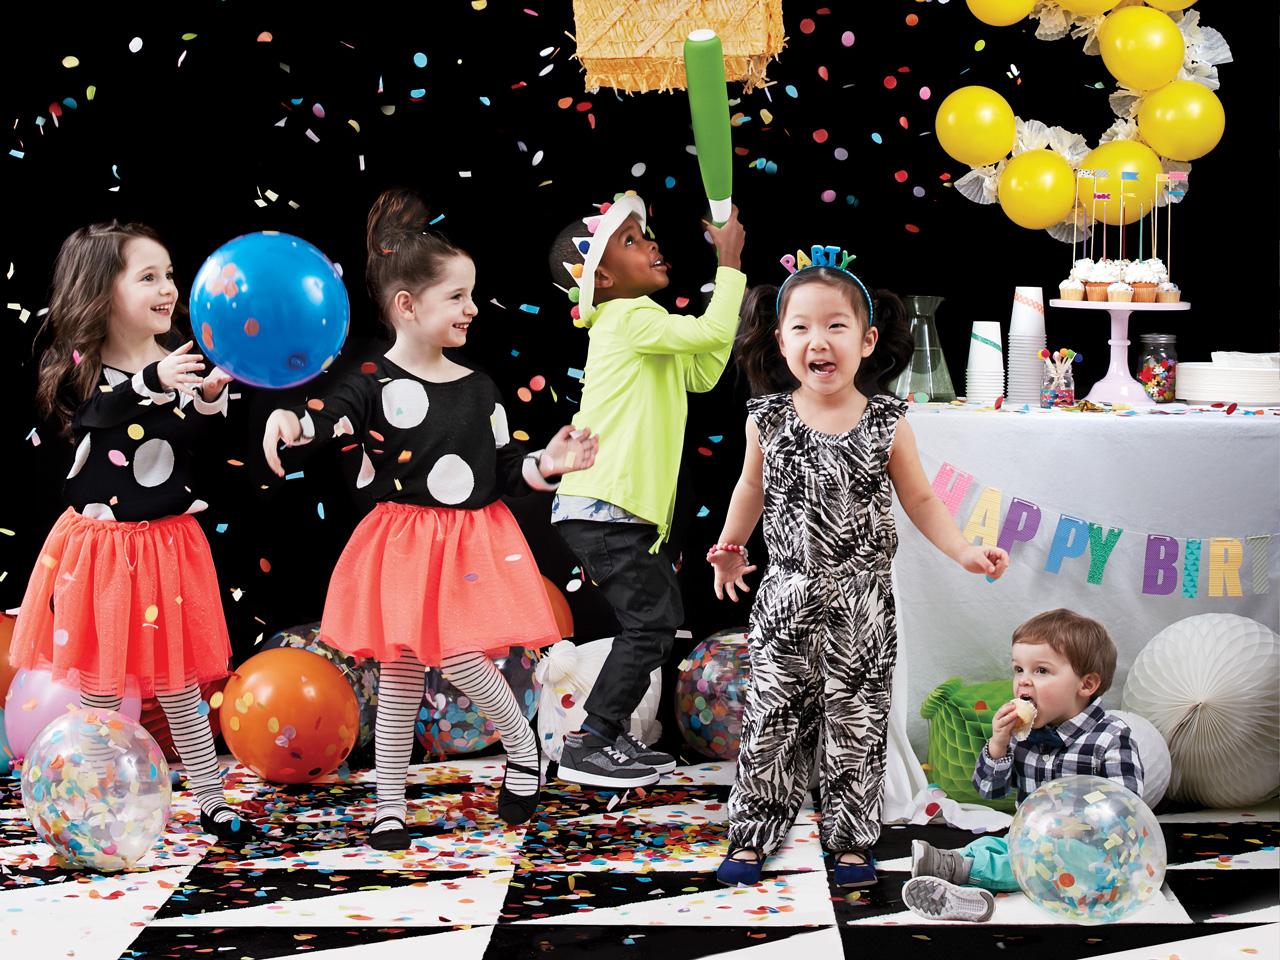 cheap ways to entertain kids at a party 1280x960 - برگزاری جشن تولد خلاقانه و شاد برای کودکان